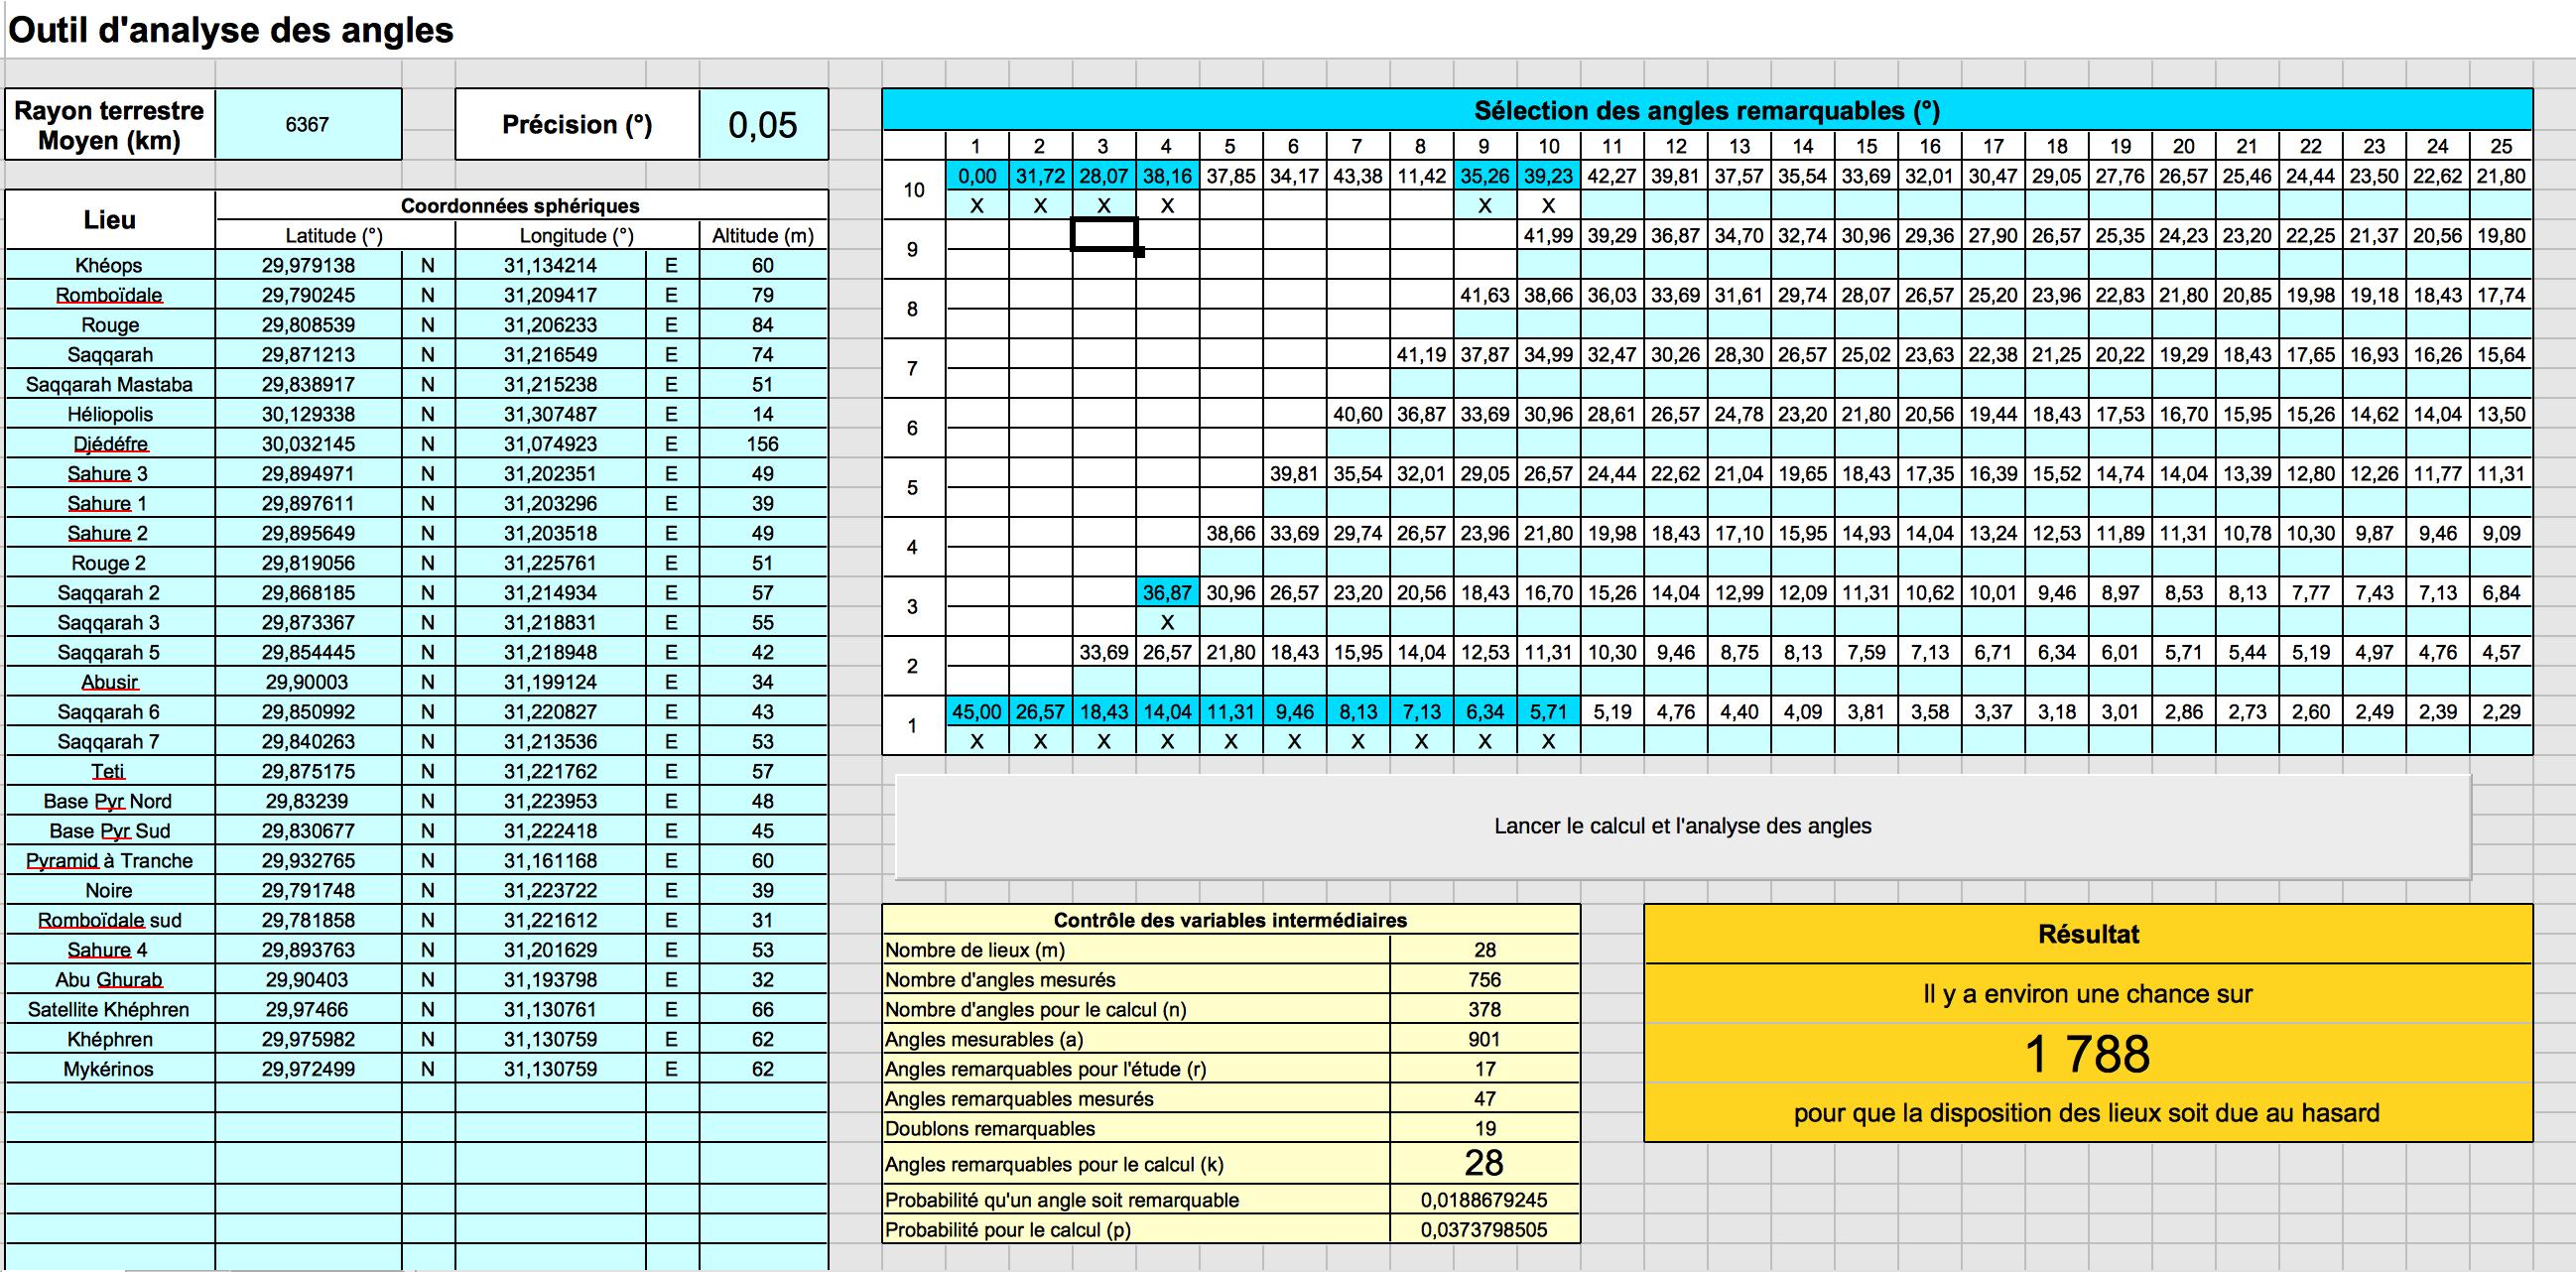 2017-11-16 23:10:42